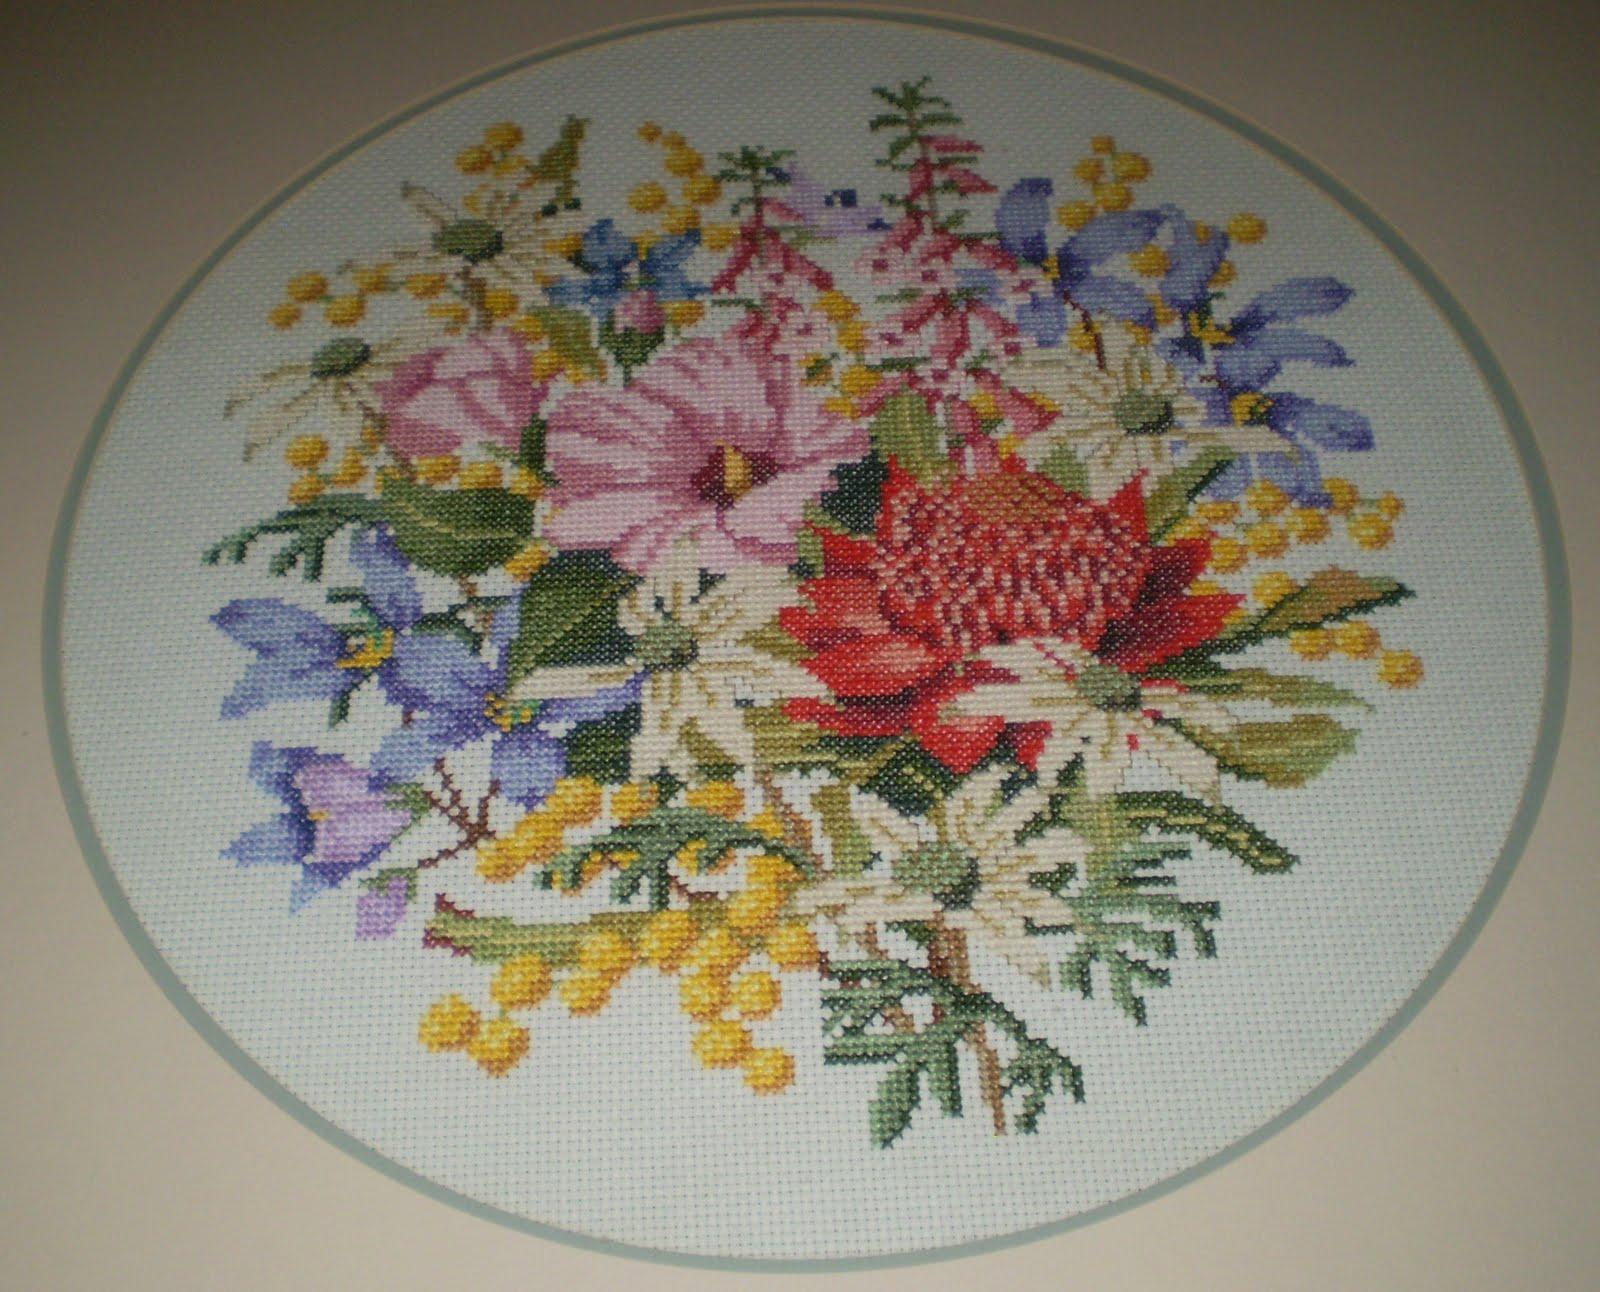 Australian Native Flowers Embroidery Designs